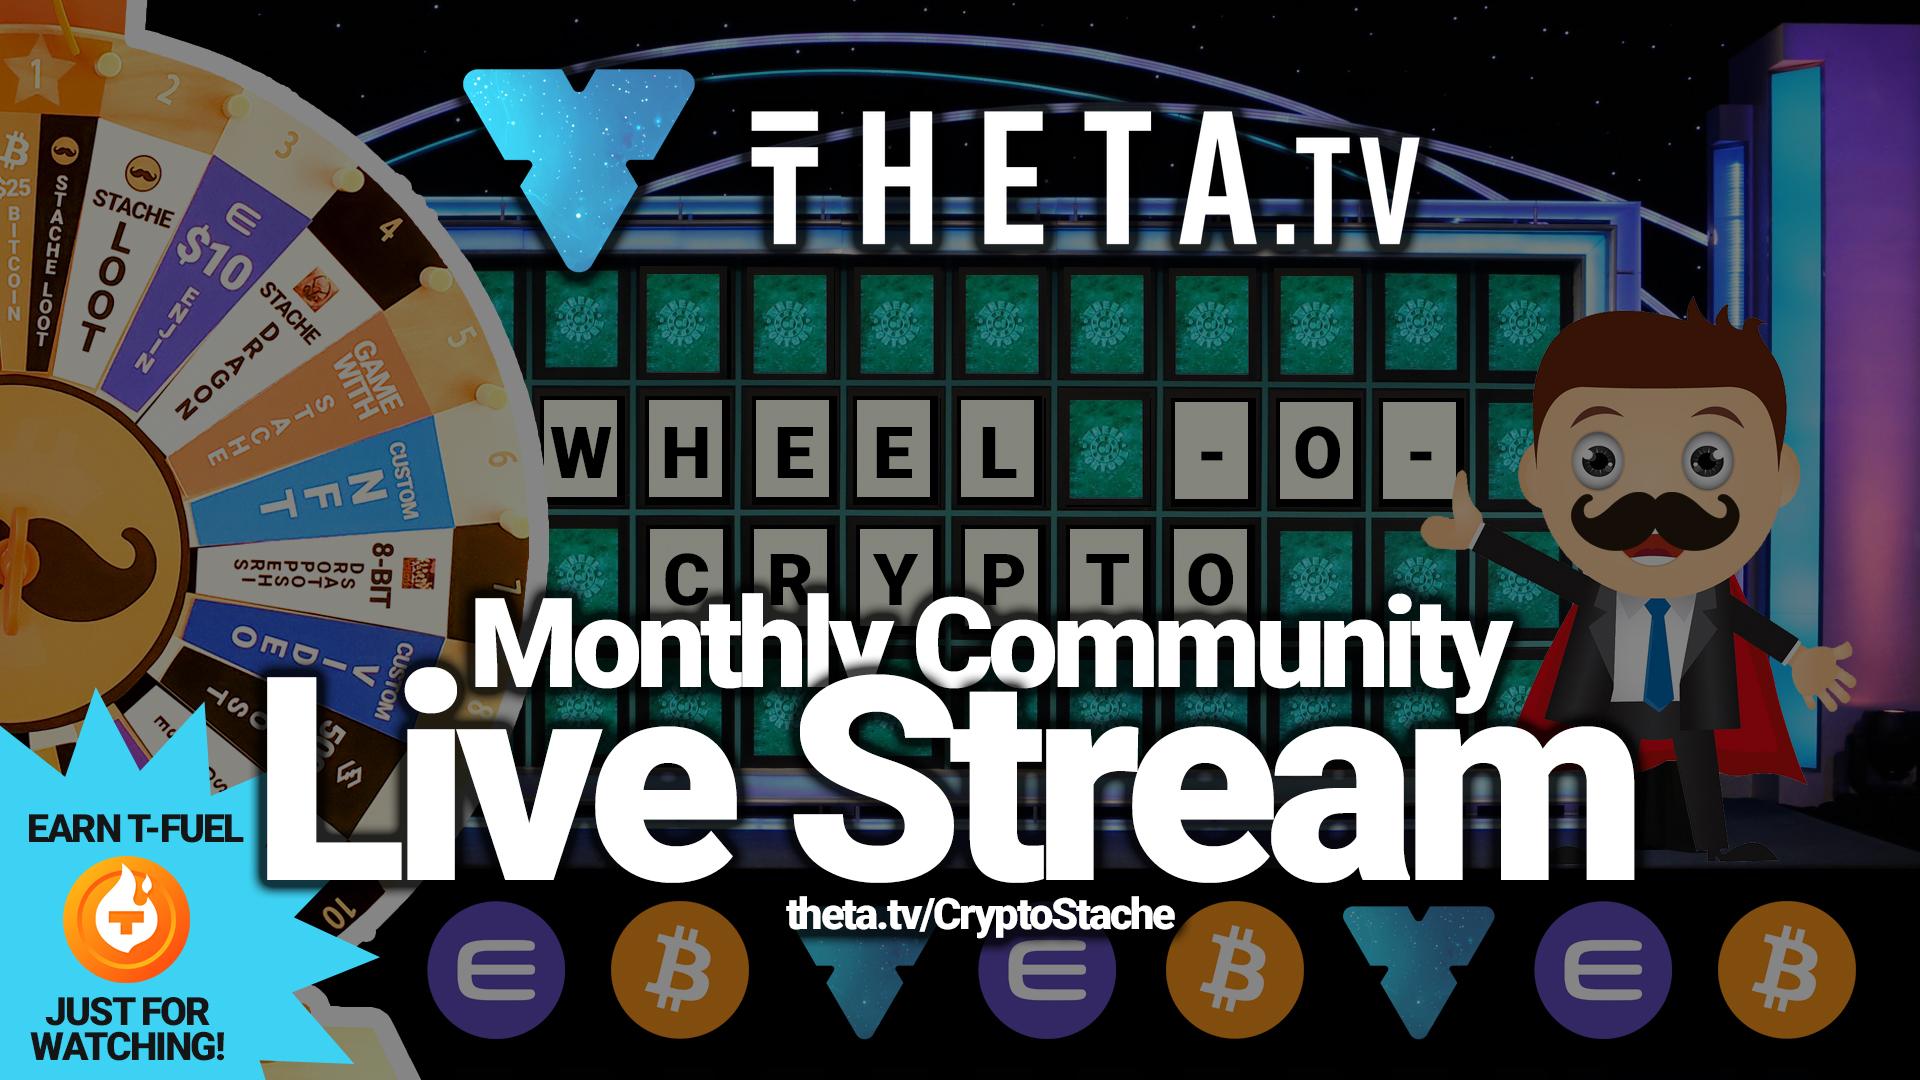 theta tv sliver live stream community stachers cryptostache TFUEL wheel-o-crypto giveaway prizes